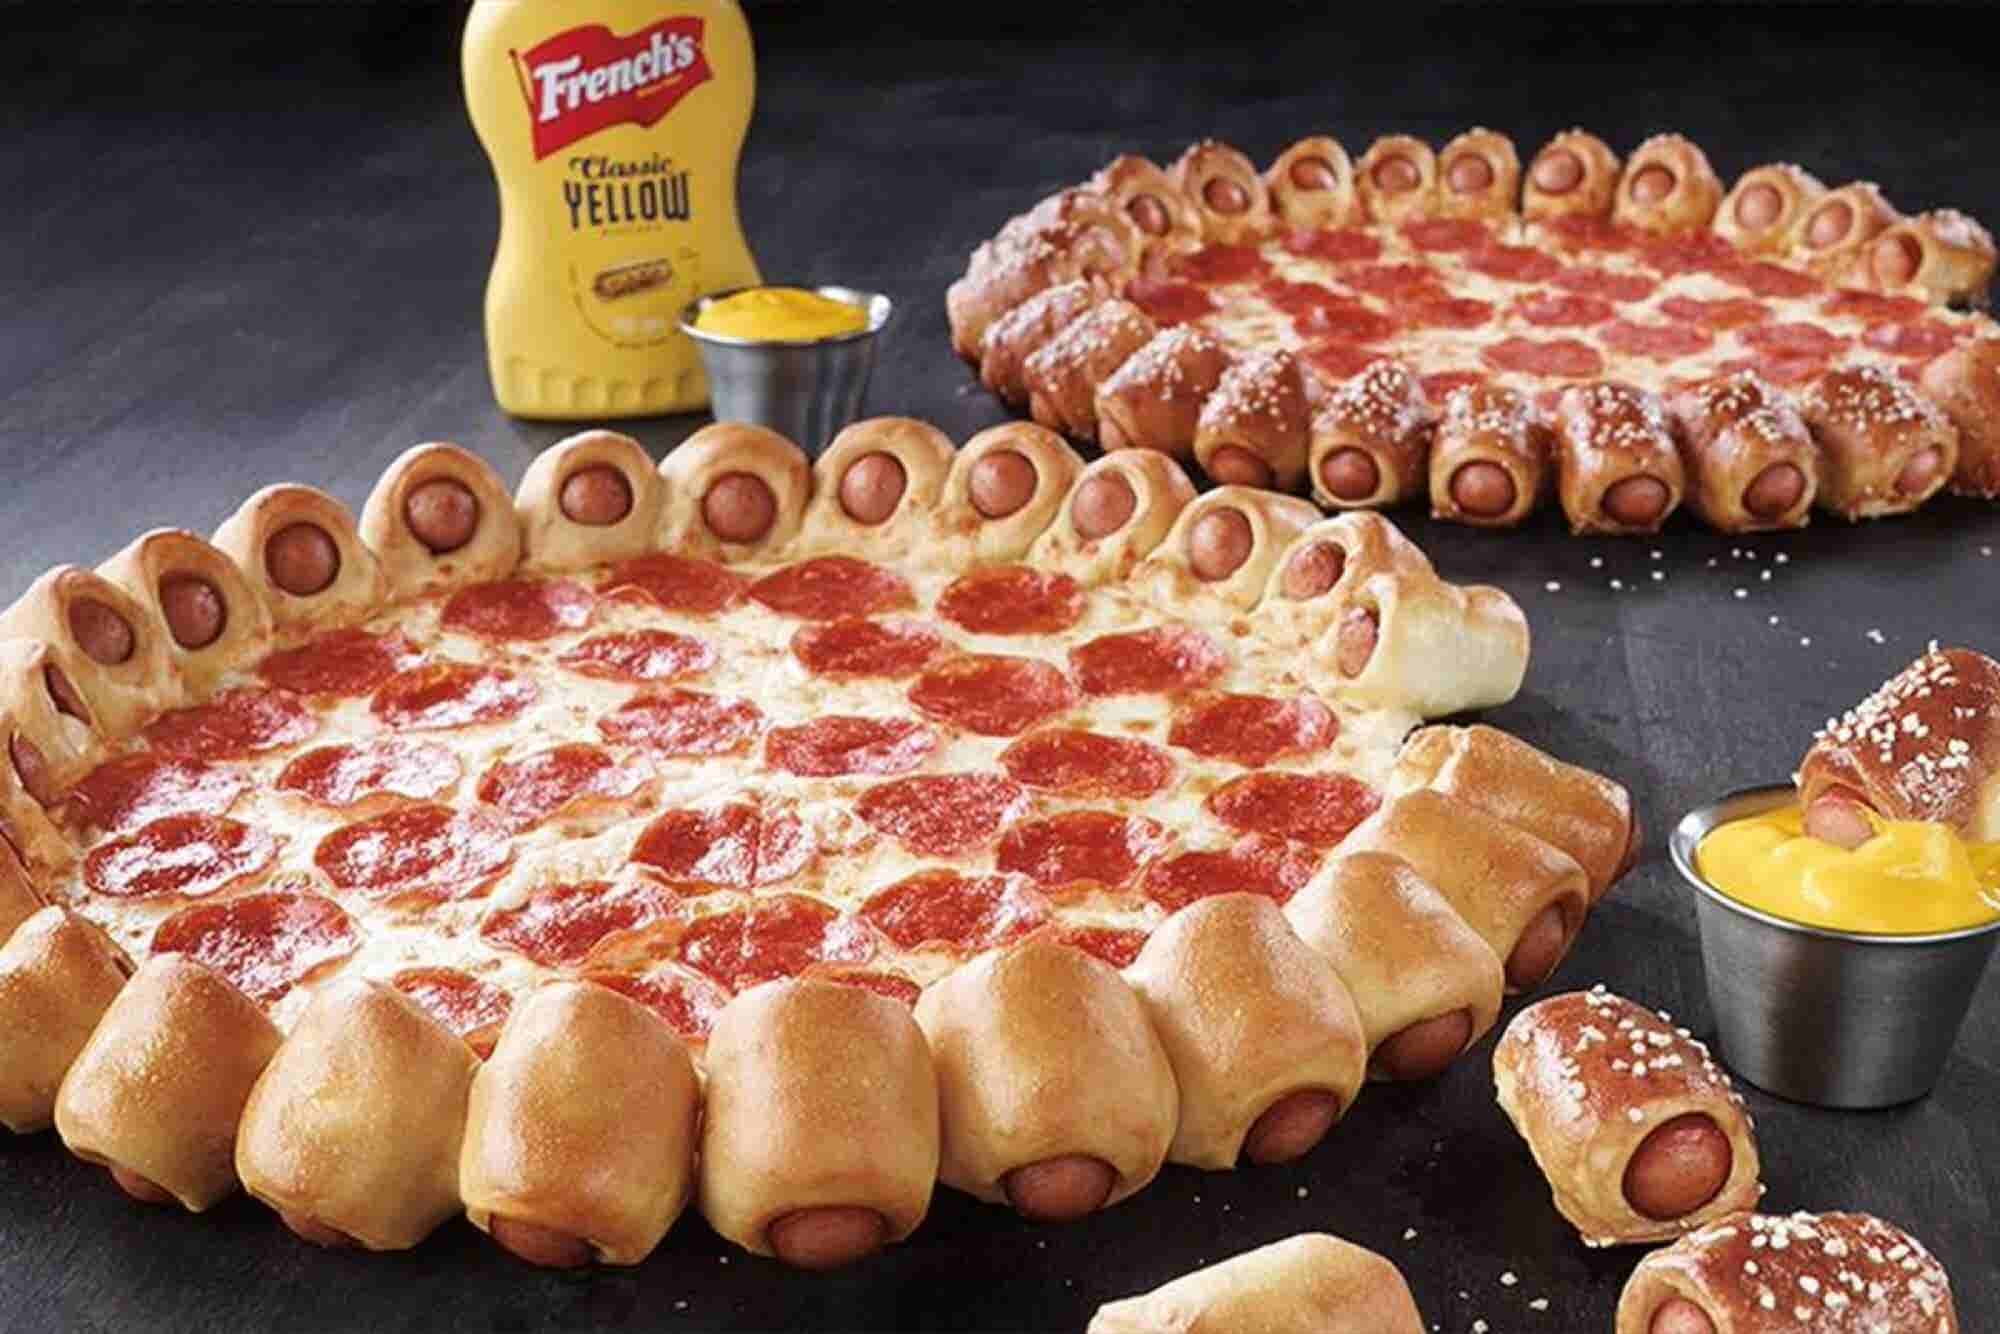 Pizza Hut's Latest Mashup: Hot-Dog Pizza Crust